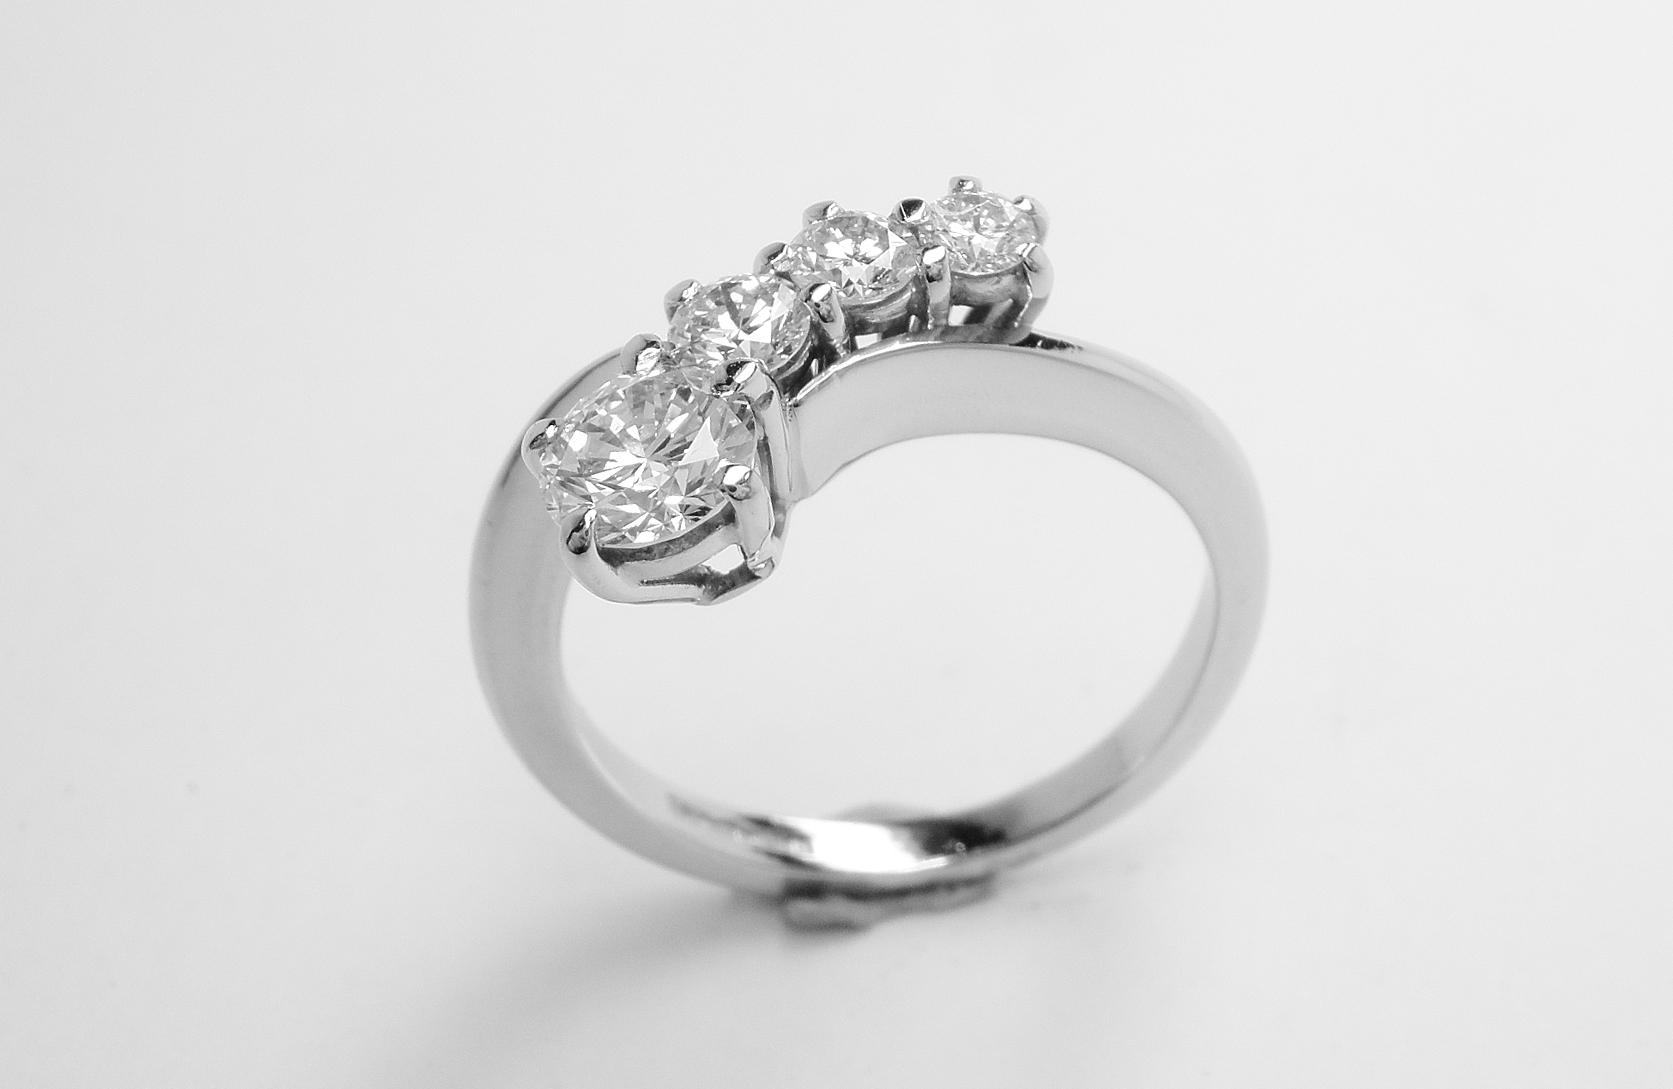 A 4 stone round brilliant cut diamond 'comet' engagement ring mounted in platinum.